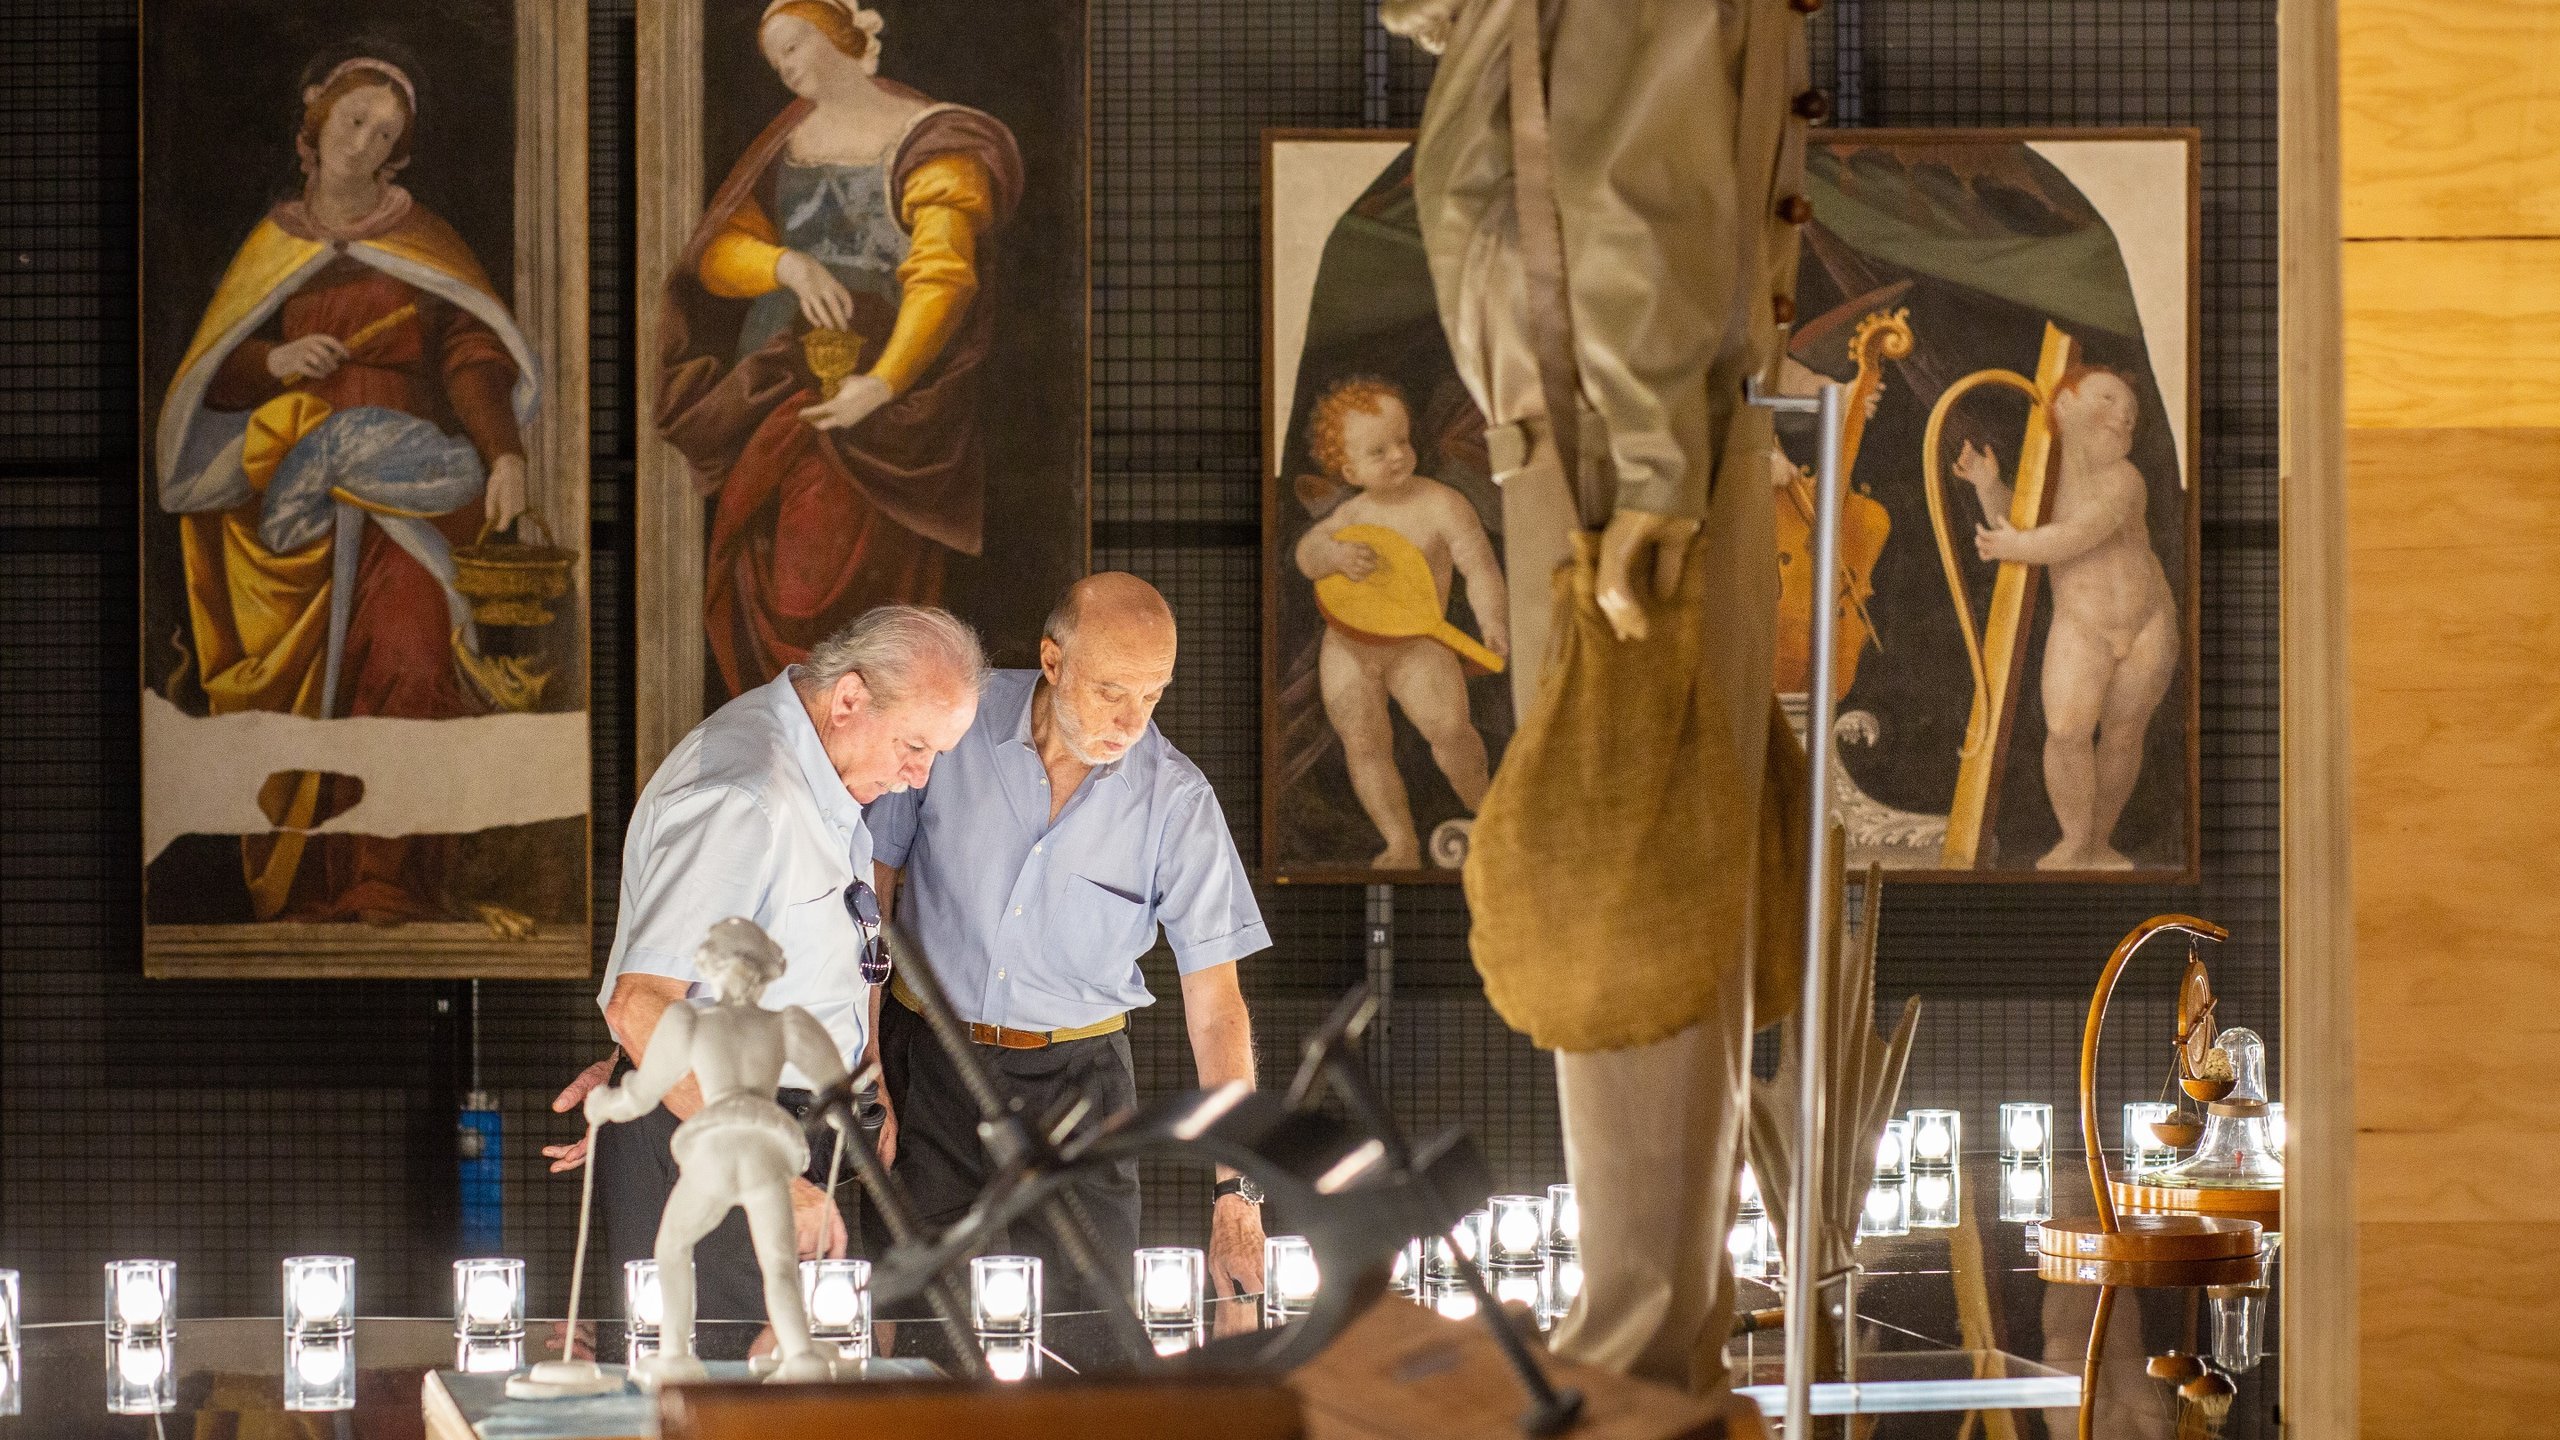 Leonardo da Vinci Museum of Science and Technology, Milan, Lombardy, Italy